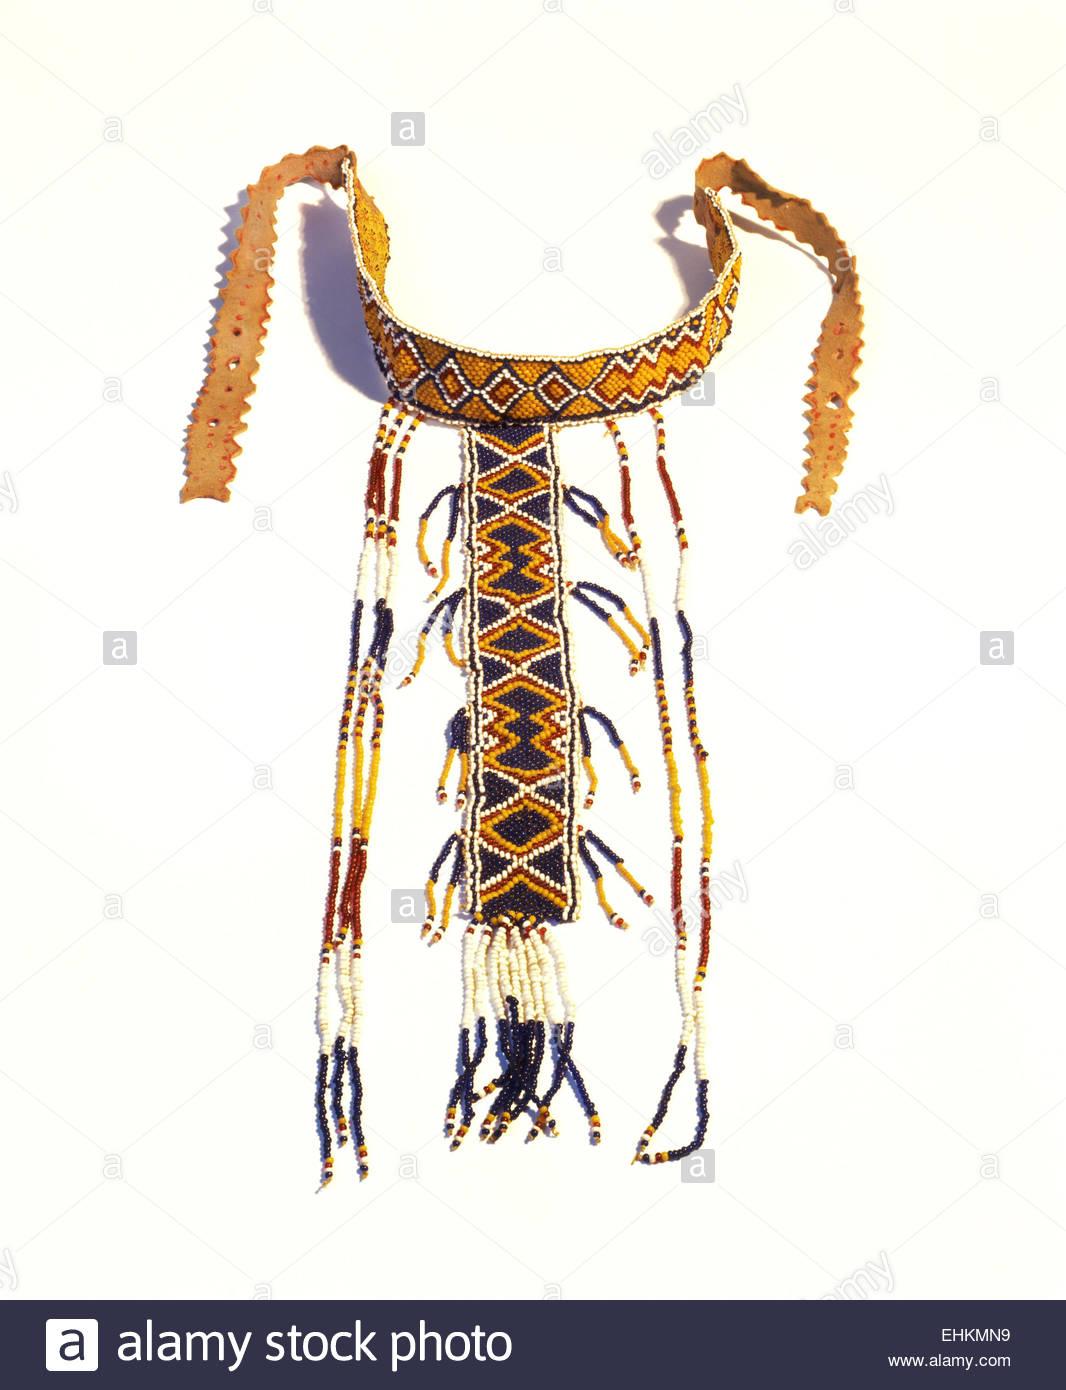 Western Apache girl's puberty ceremony T-shaped beaded necklace. Arizona, USA. - Stock Image